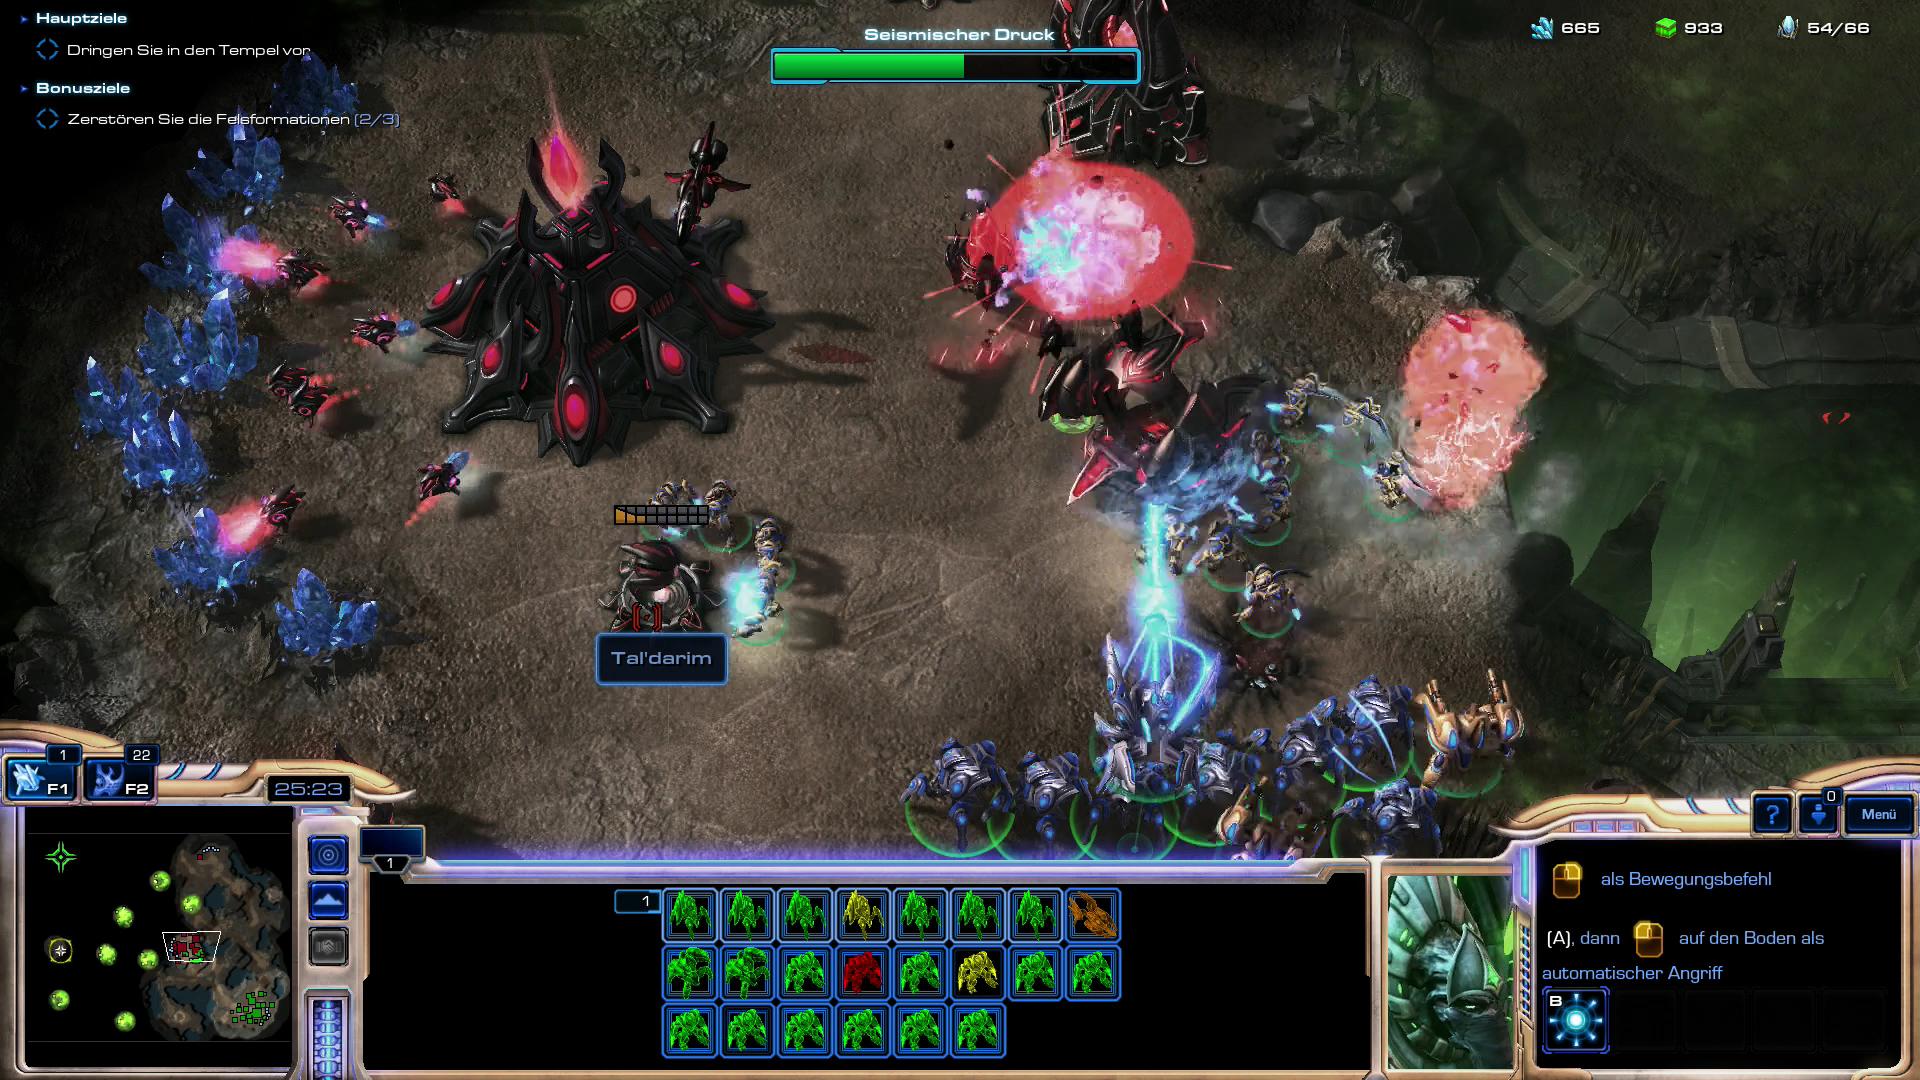 Starcraft 2 3.0 im Test: Grandioses Finale mit den Protoss - Die Grafik ist liebevoll in Szene gesetzt. (Screenshot: Golem.de)